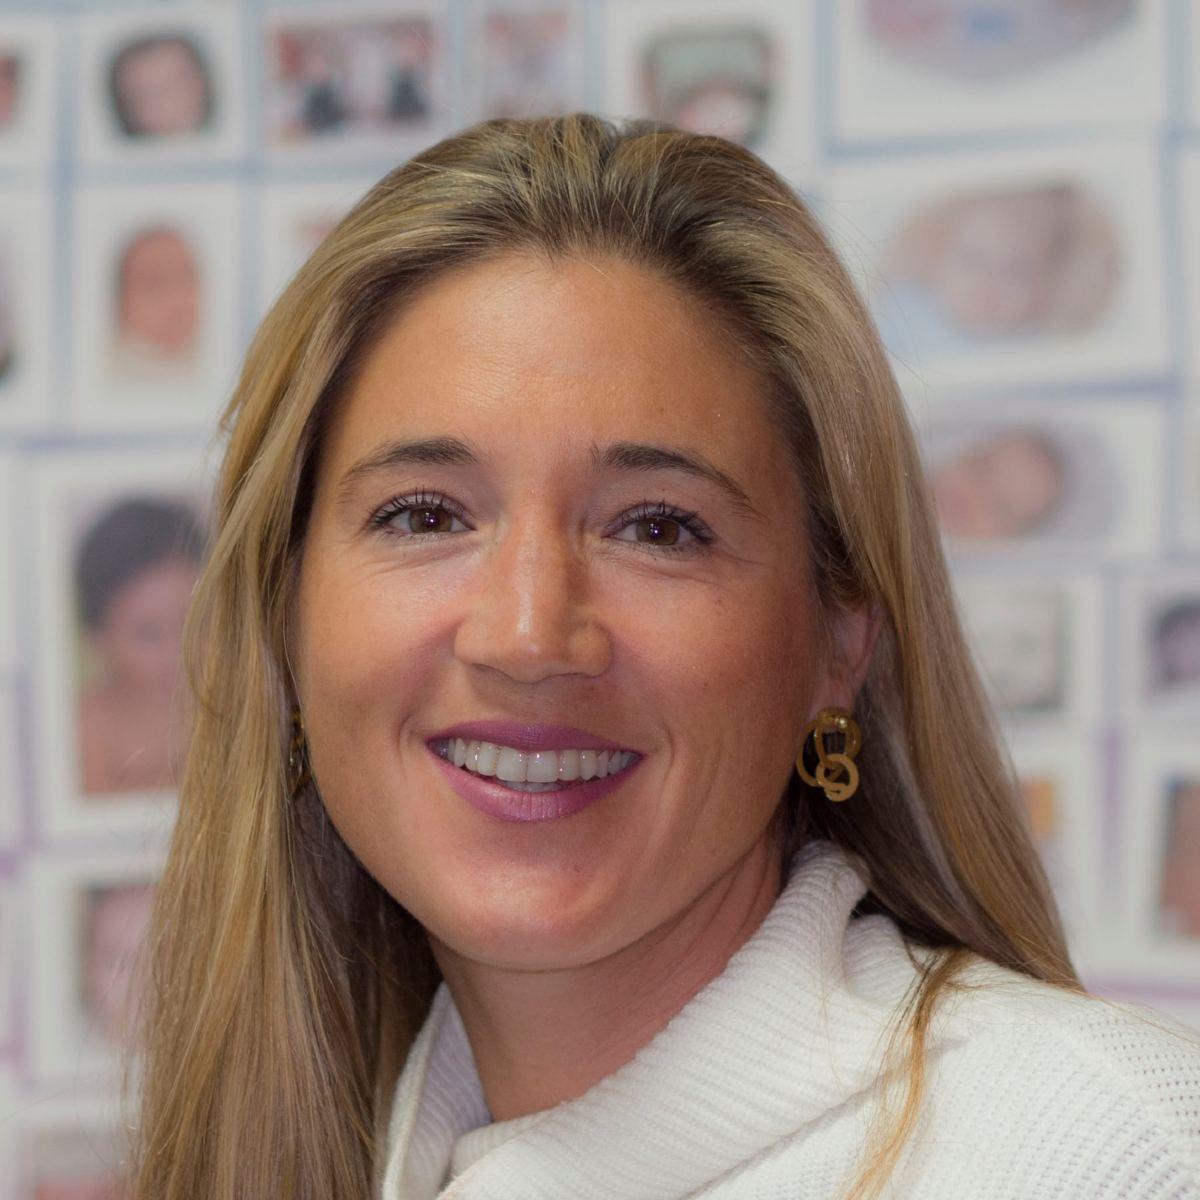 Guillermina Alonso